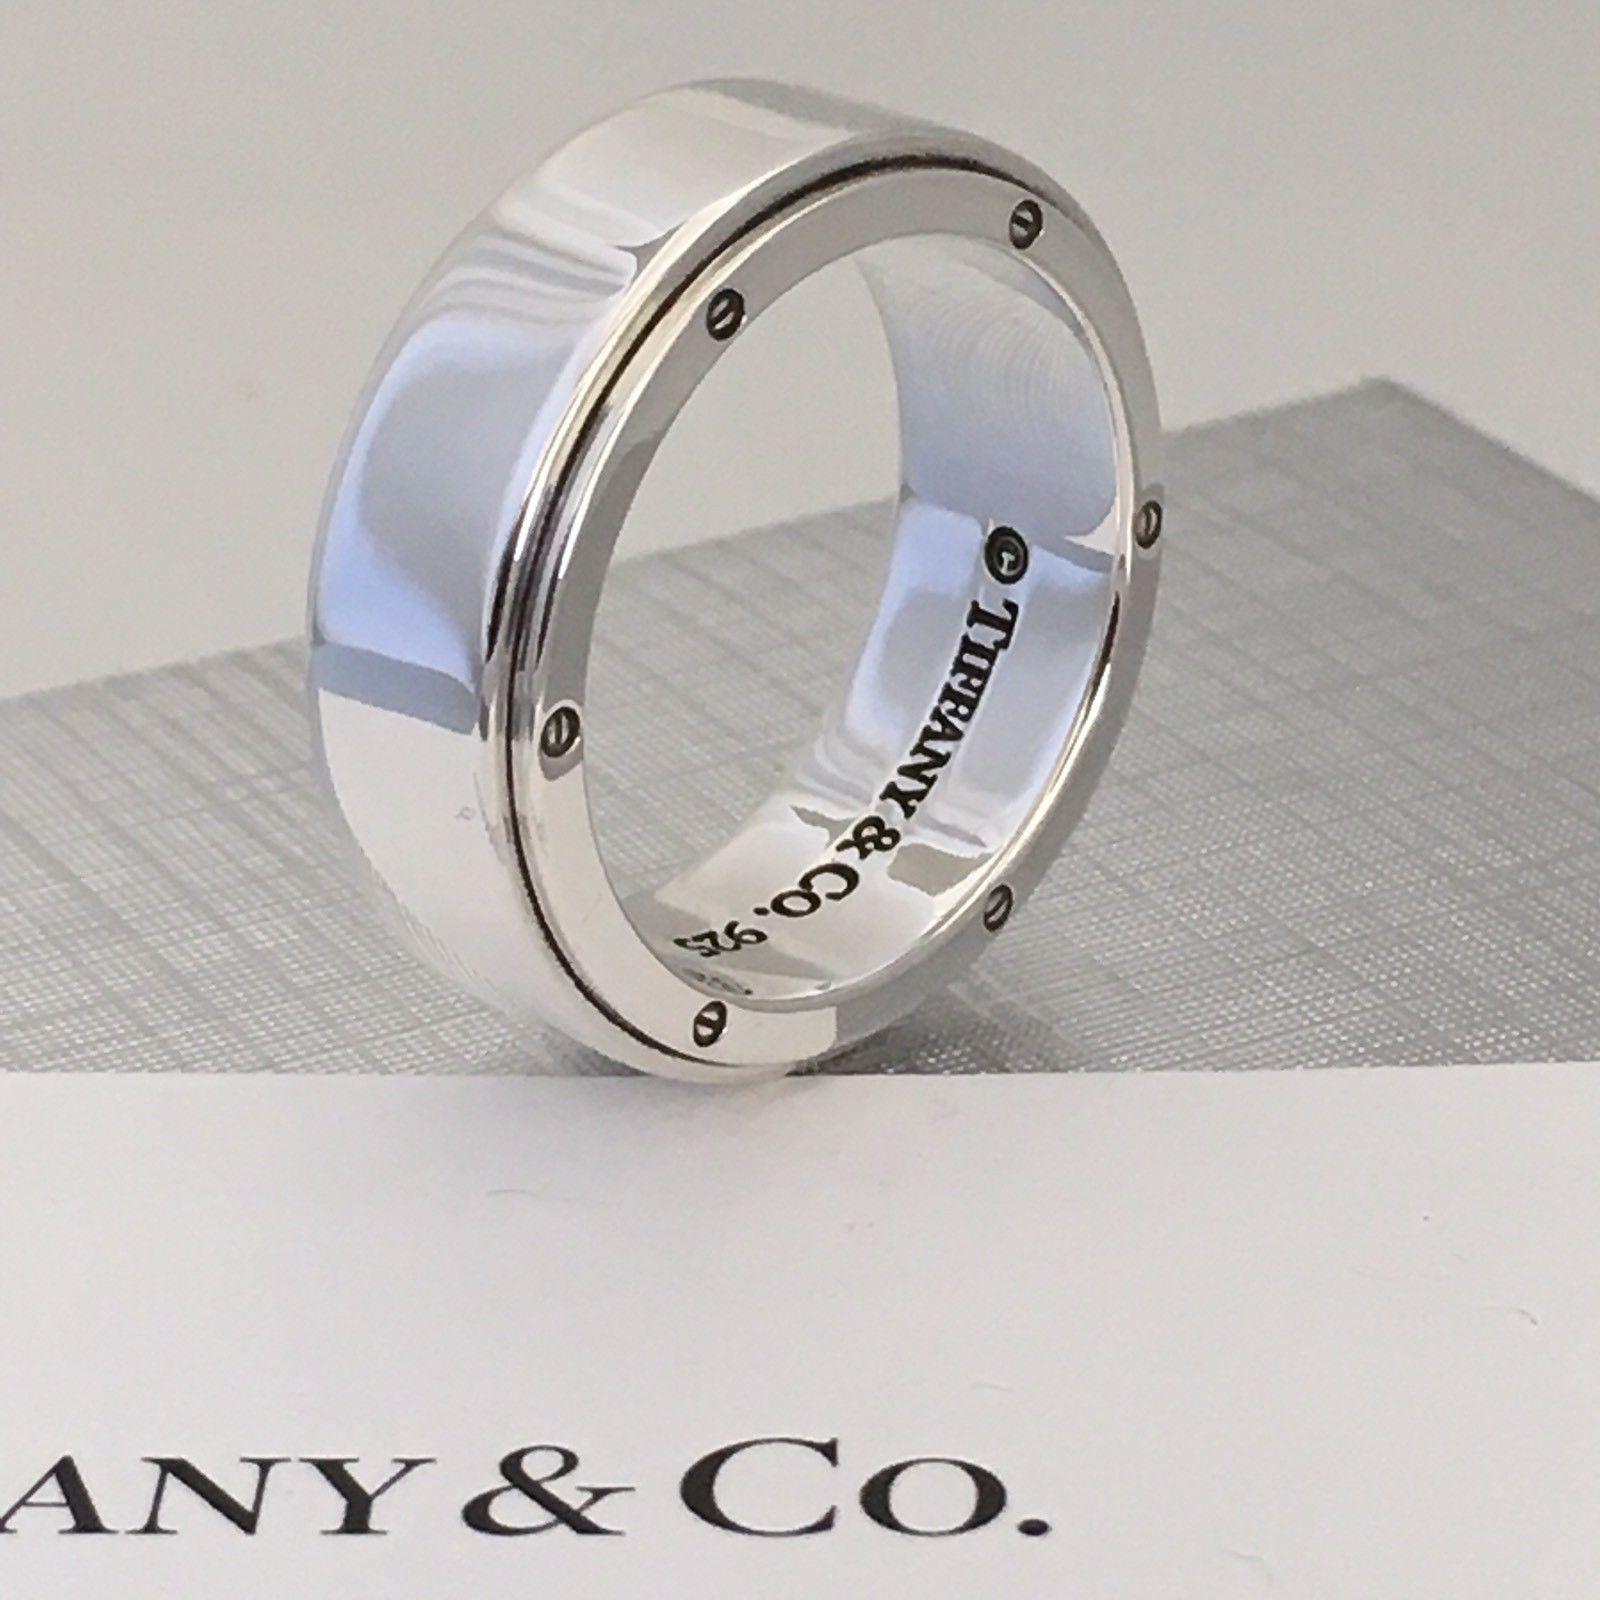 21a63987a Tiffany & Co Men's Unisex Sterling Silver Metropolis Ring Size 11.5